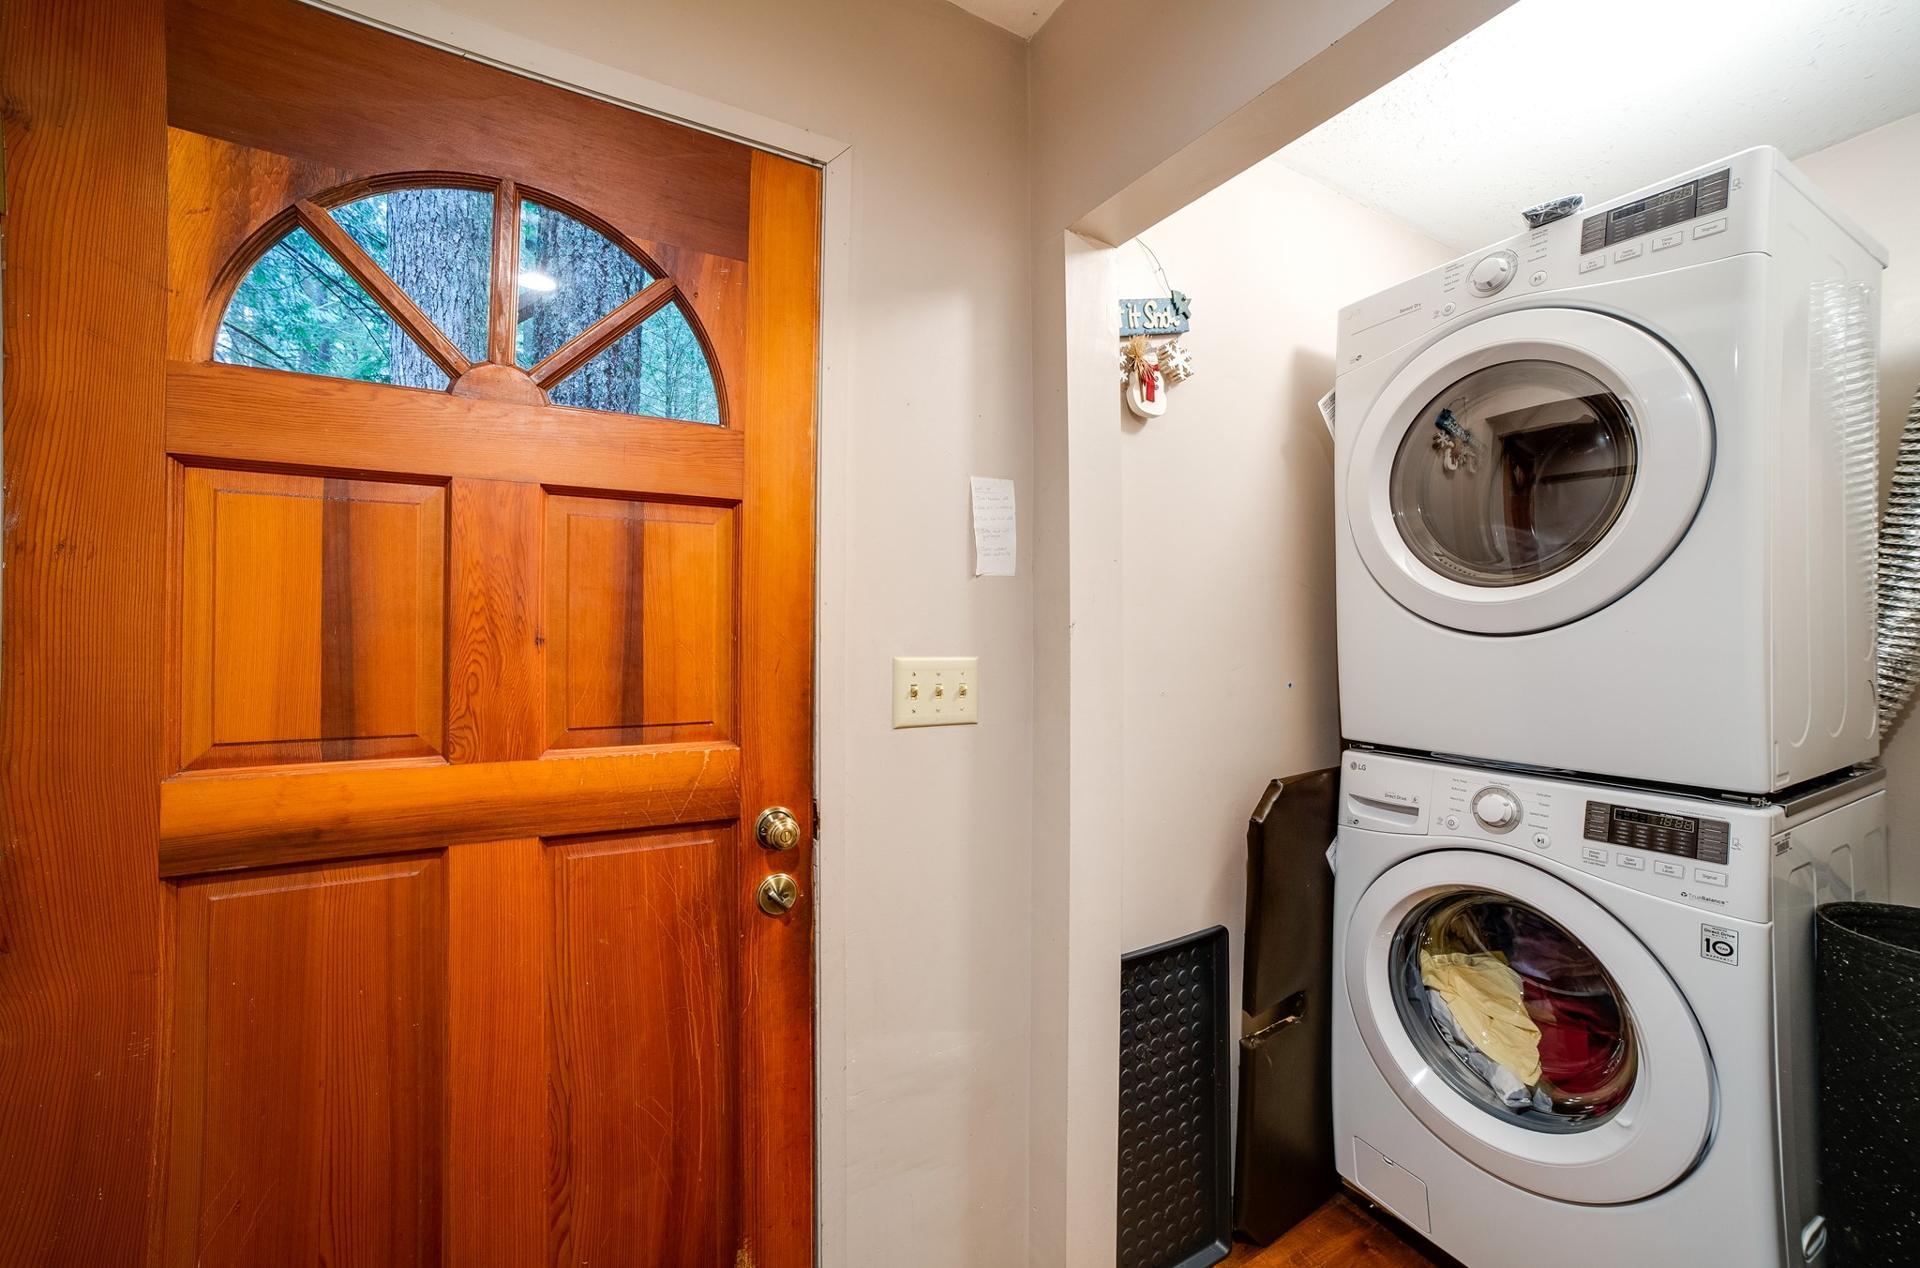 Apartment Mt  Baker Lodging Cabin  55 - HOT TUB  WOOD STOVE  BBQ  SLEEPS 10  photo 3999673